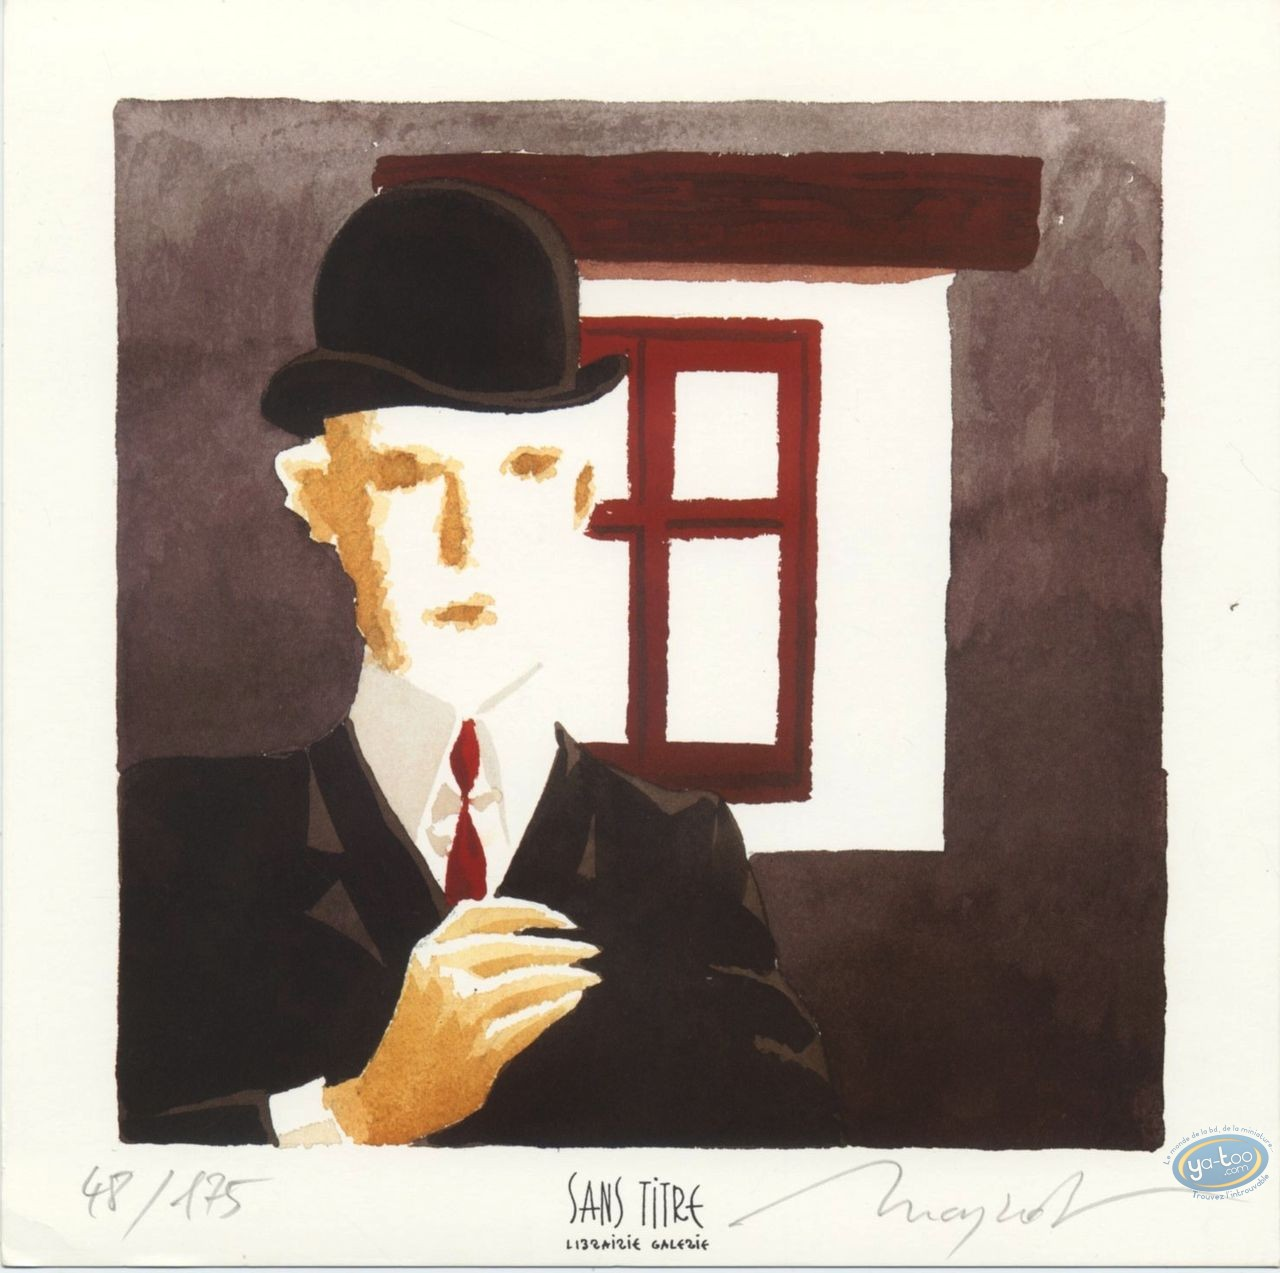 Ex-libris Offset, Monsieur Khol : Moynot, Monsieur Khol